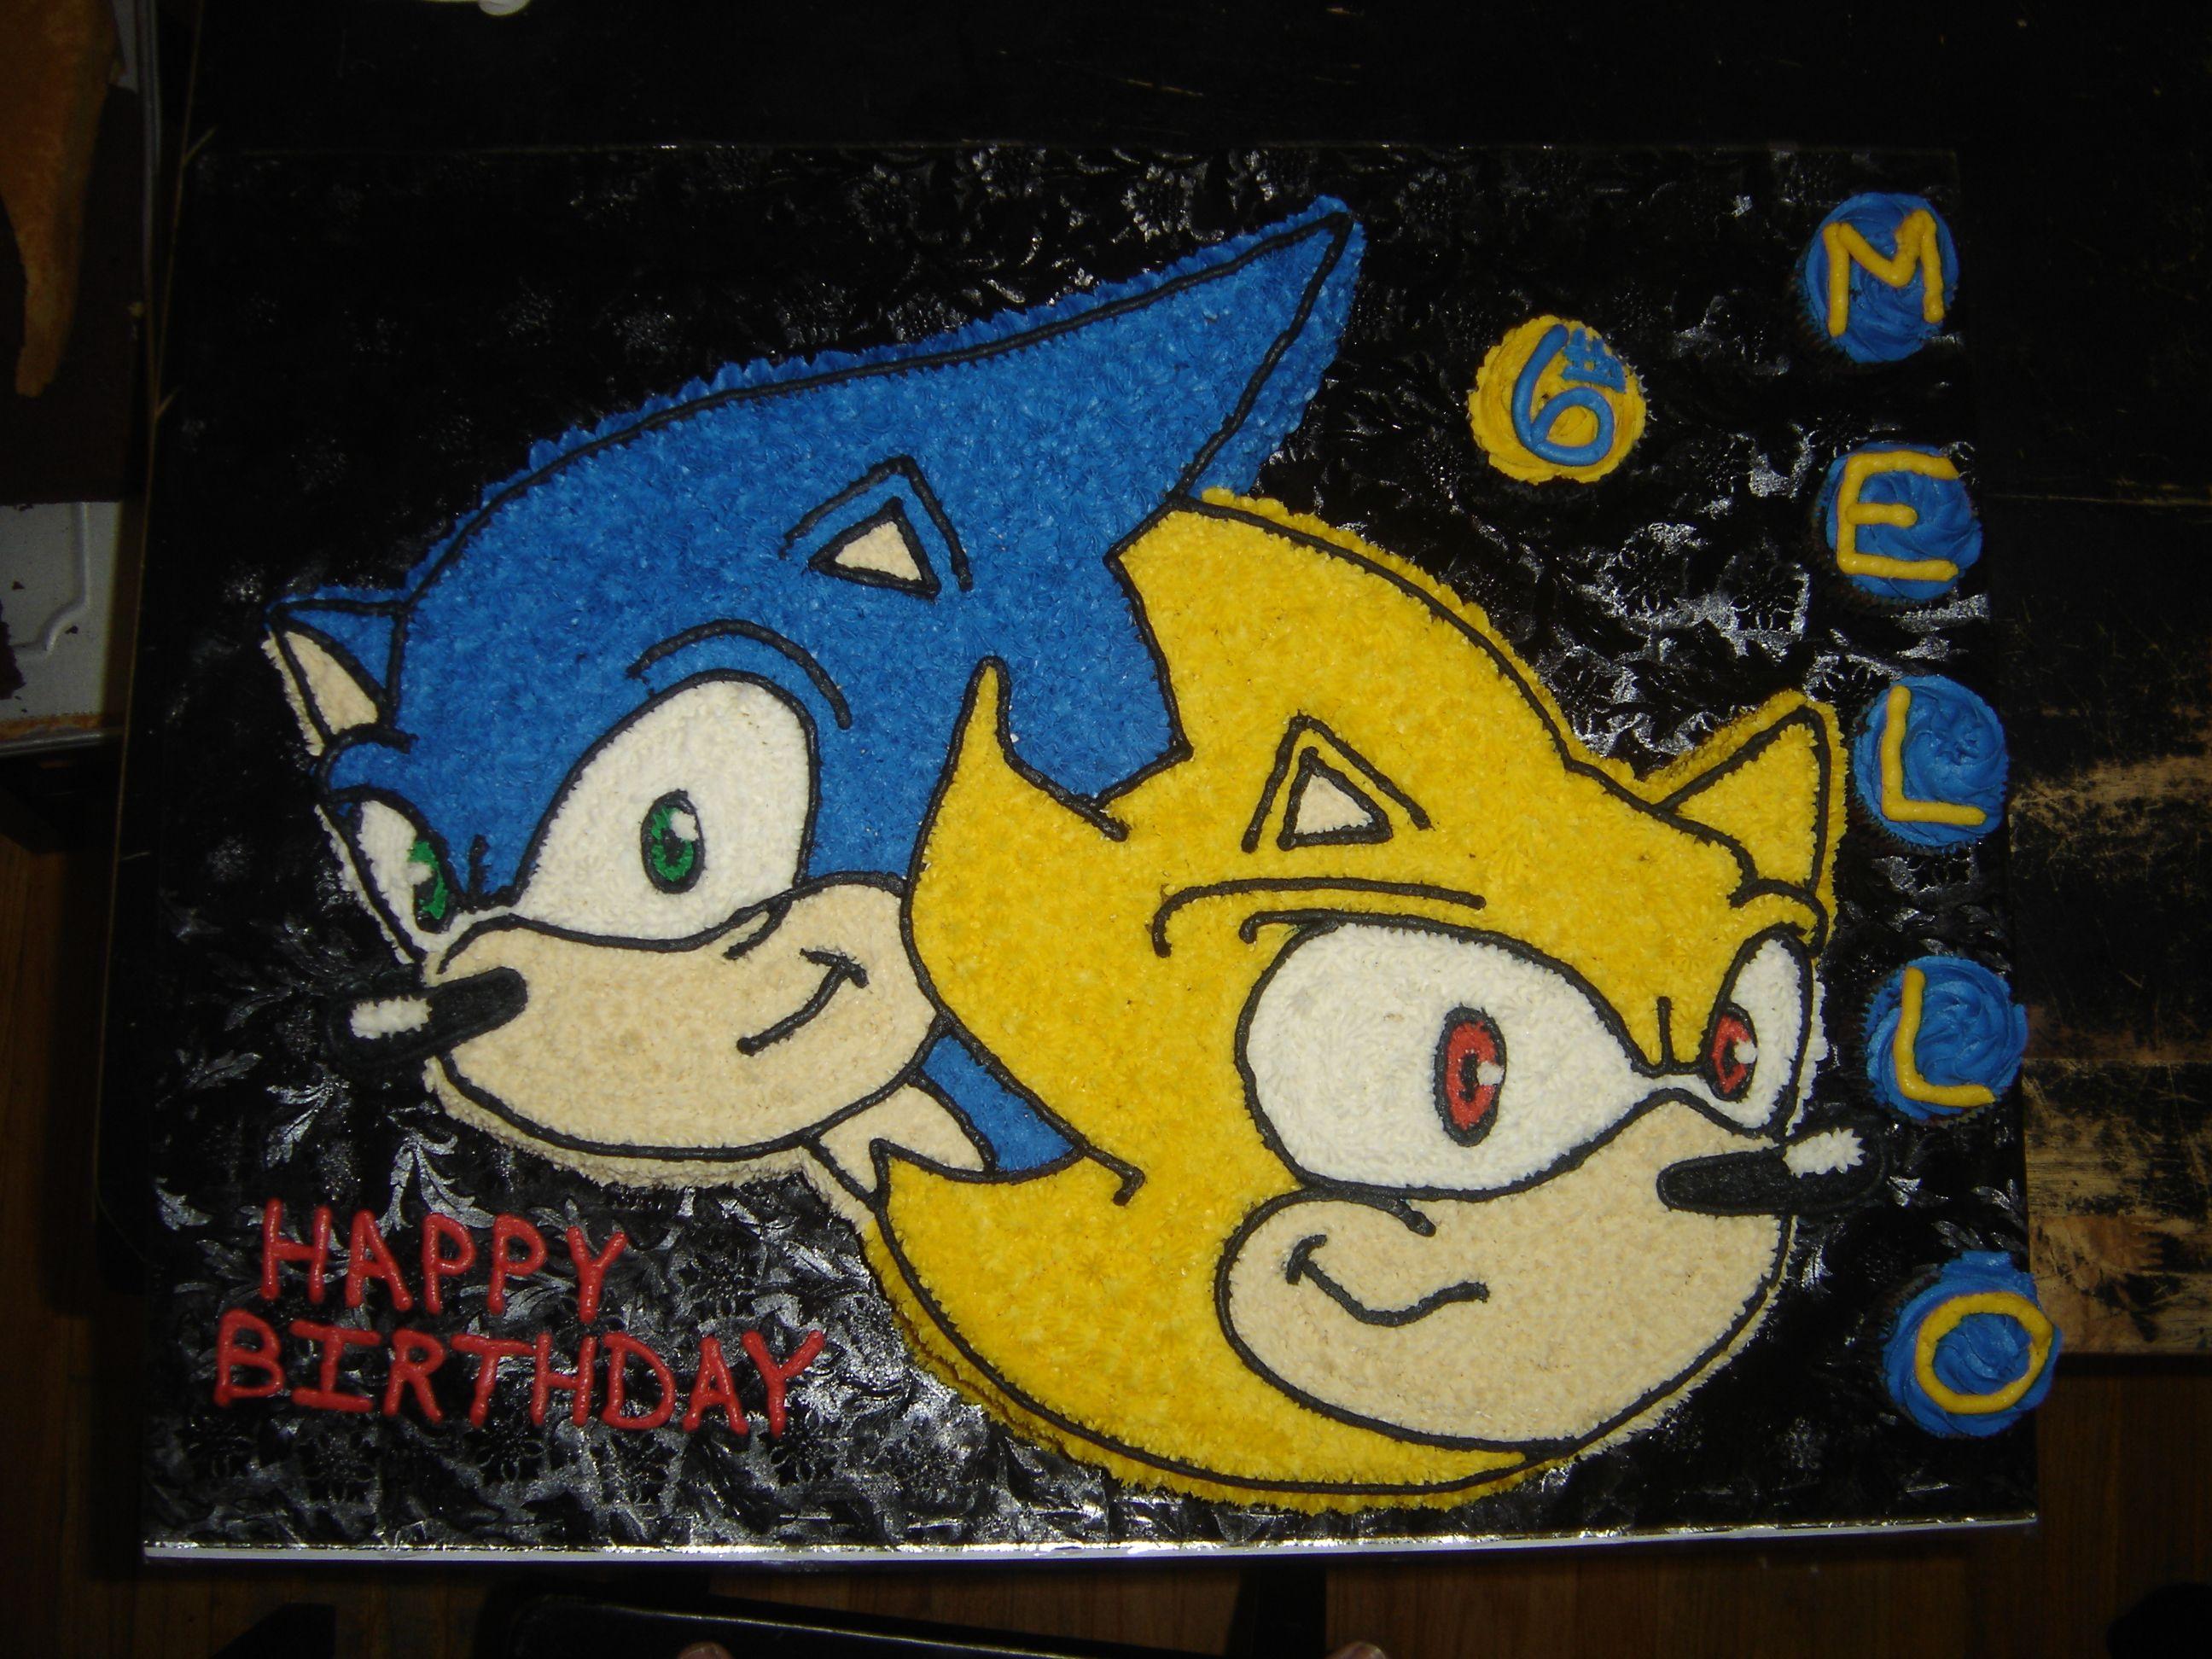 Sonic the Hedgehog cake is a half chocolate and half yellow cake ...